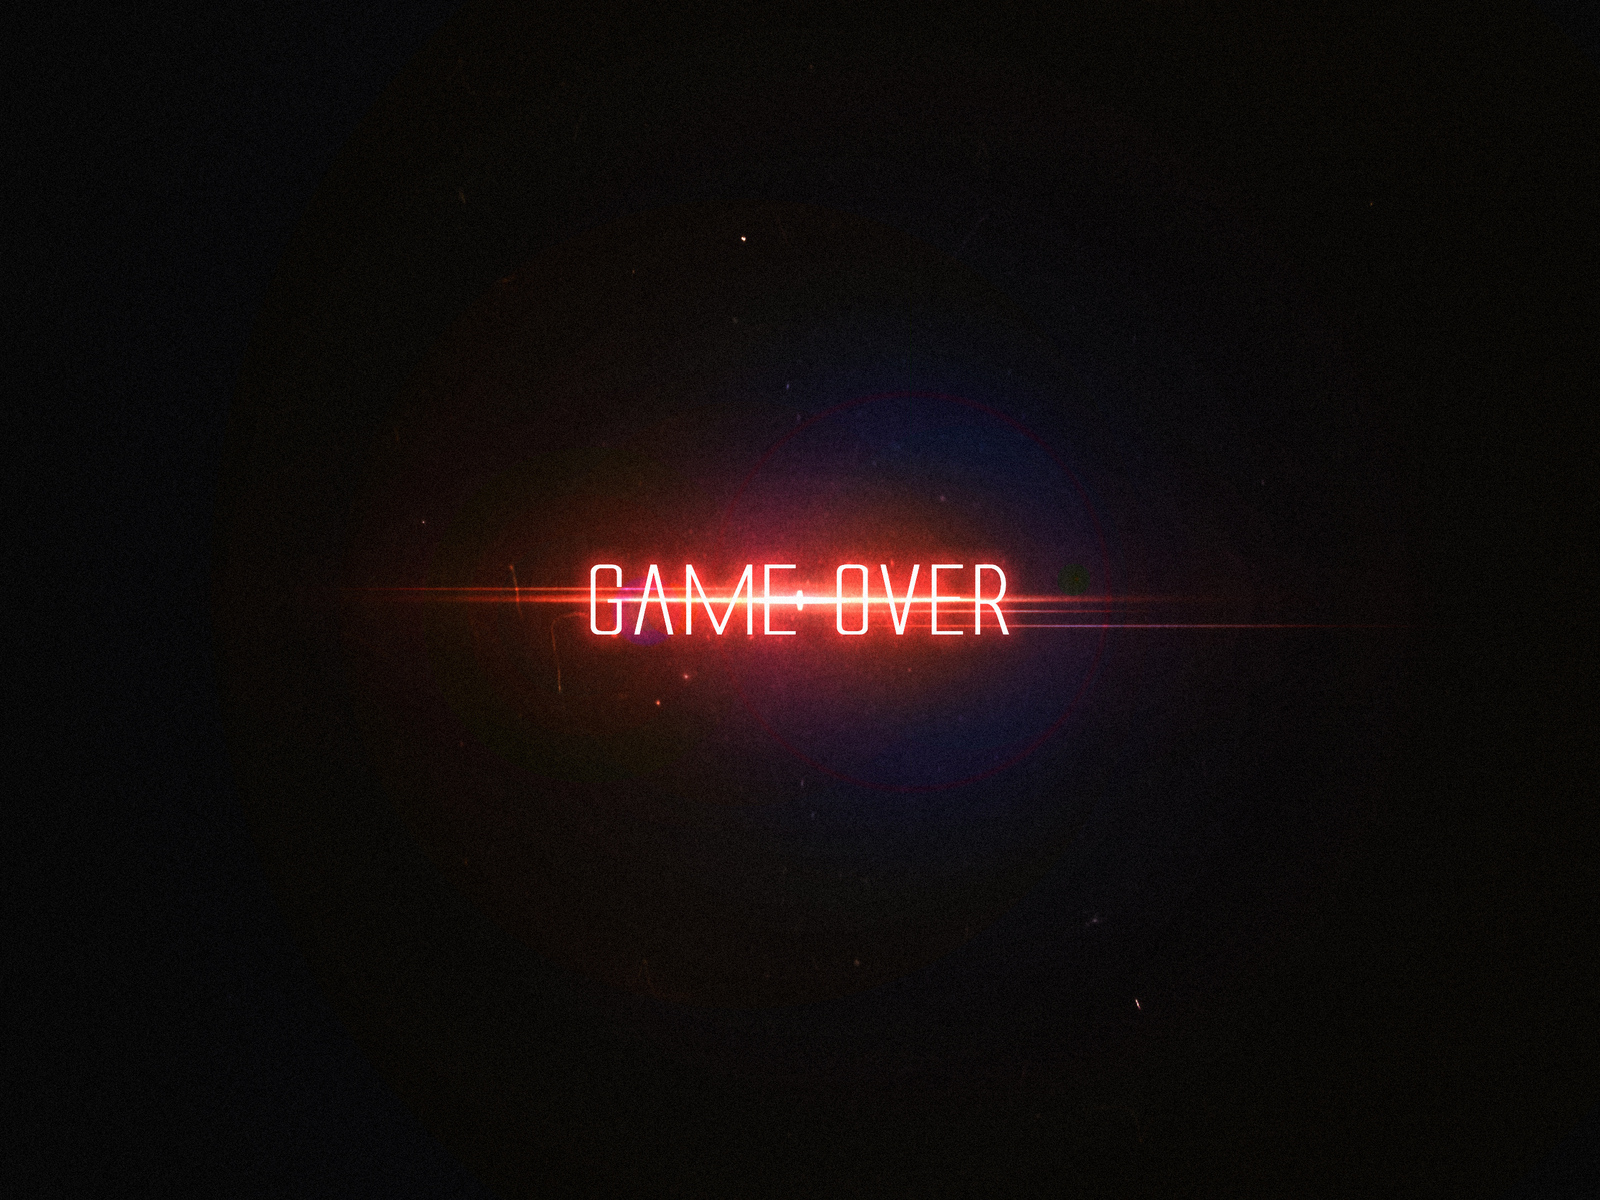 game-over-typography-4k-pz.jpg